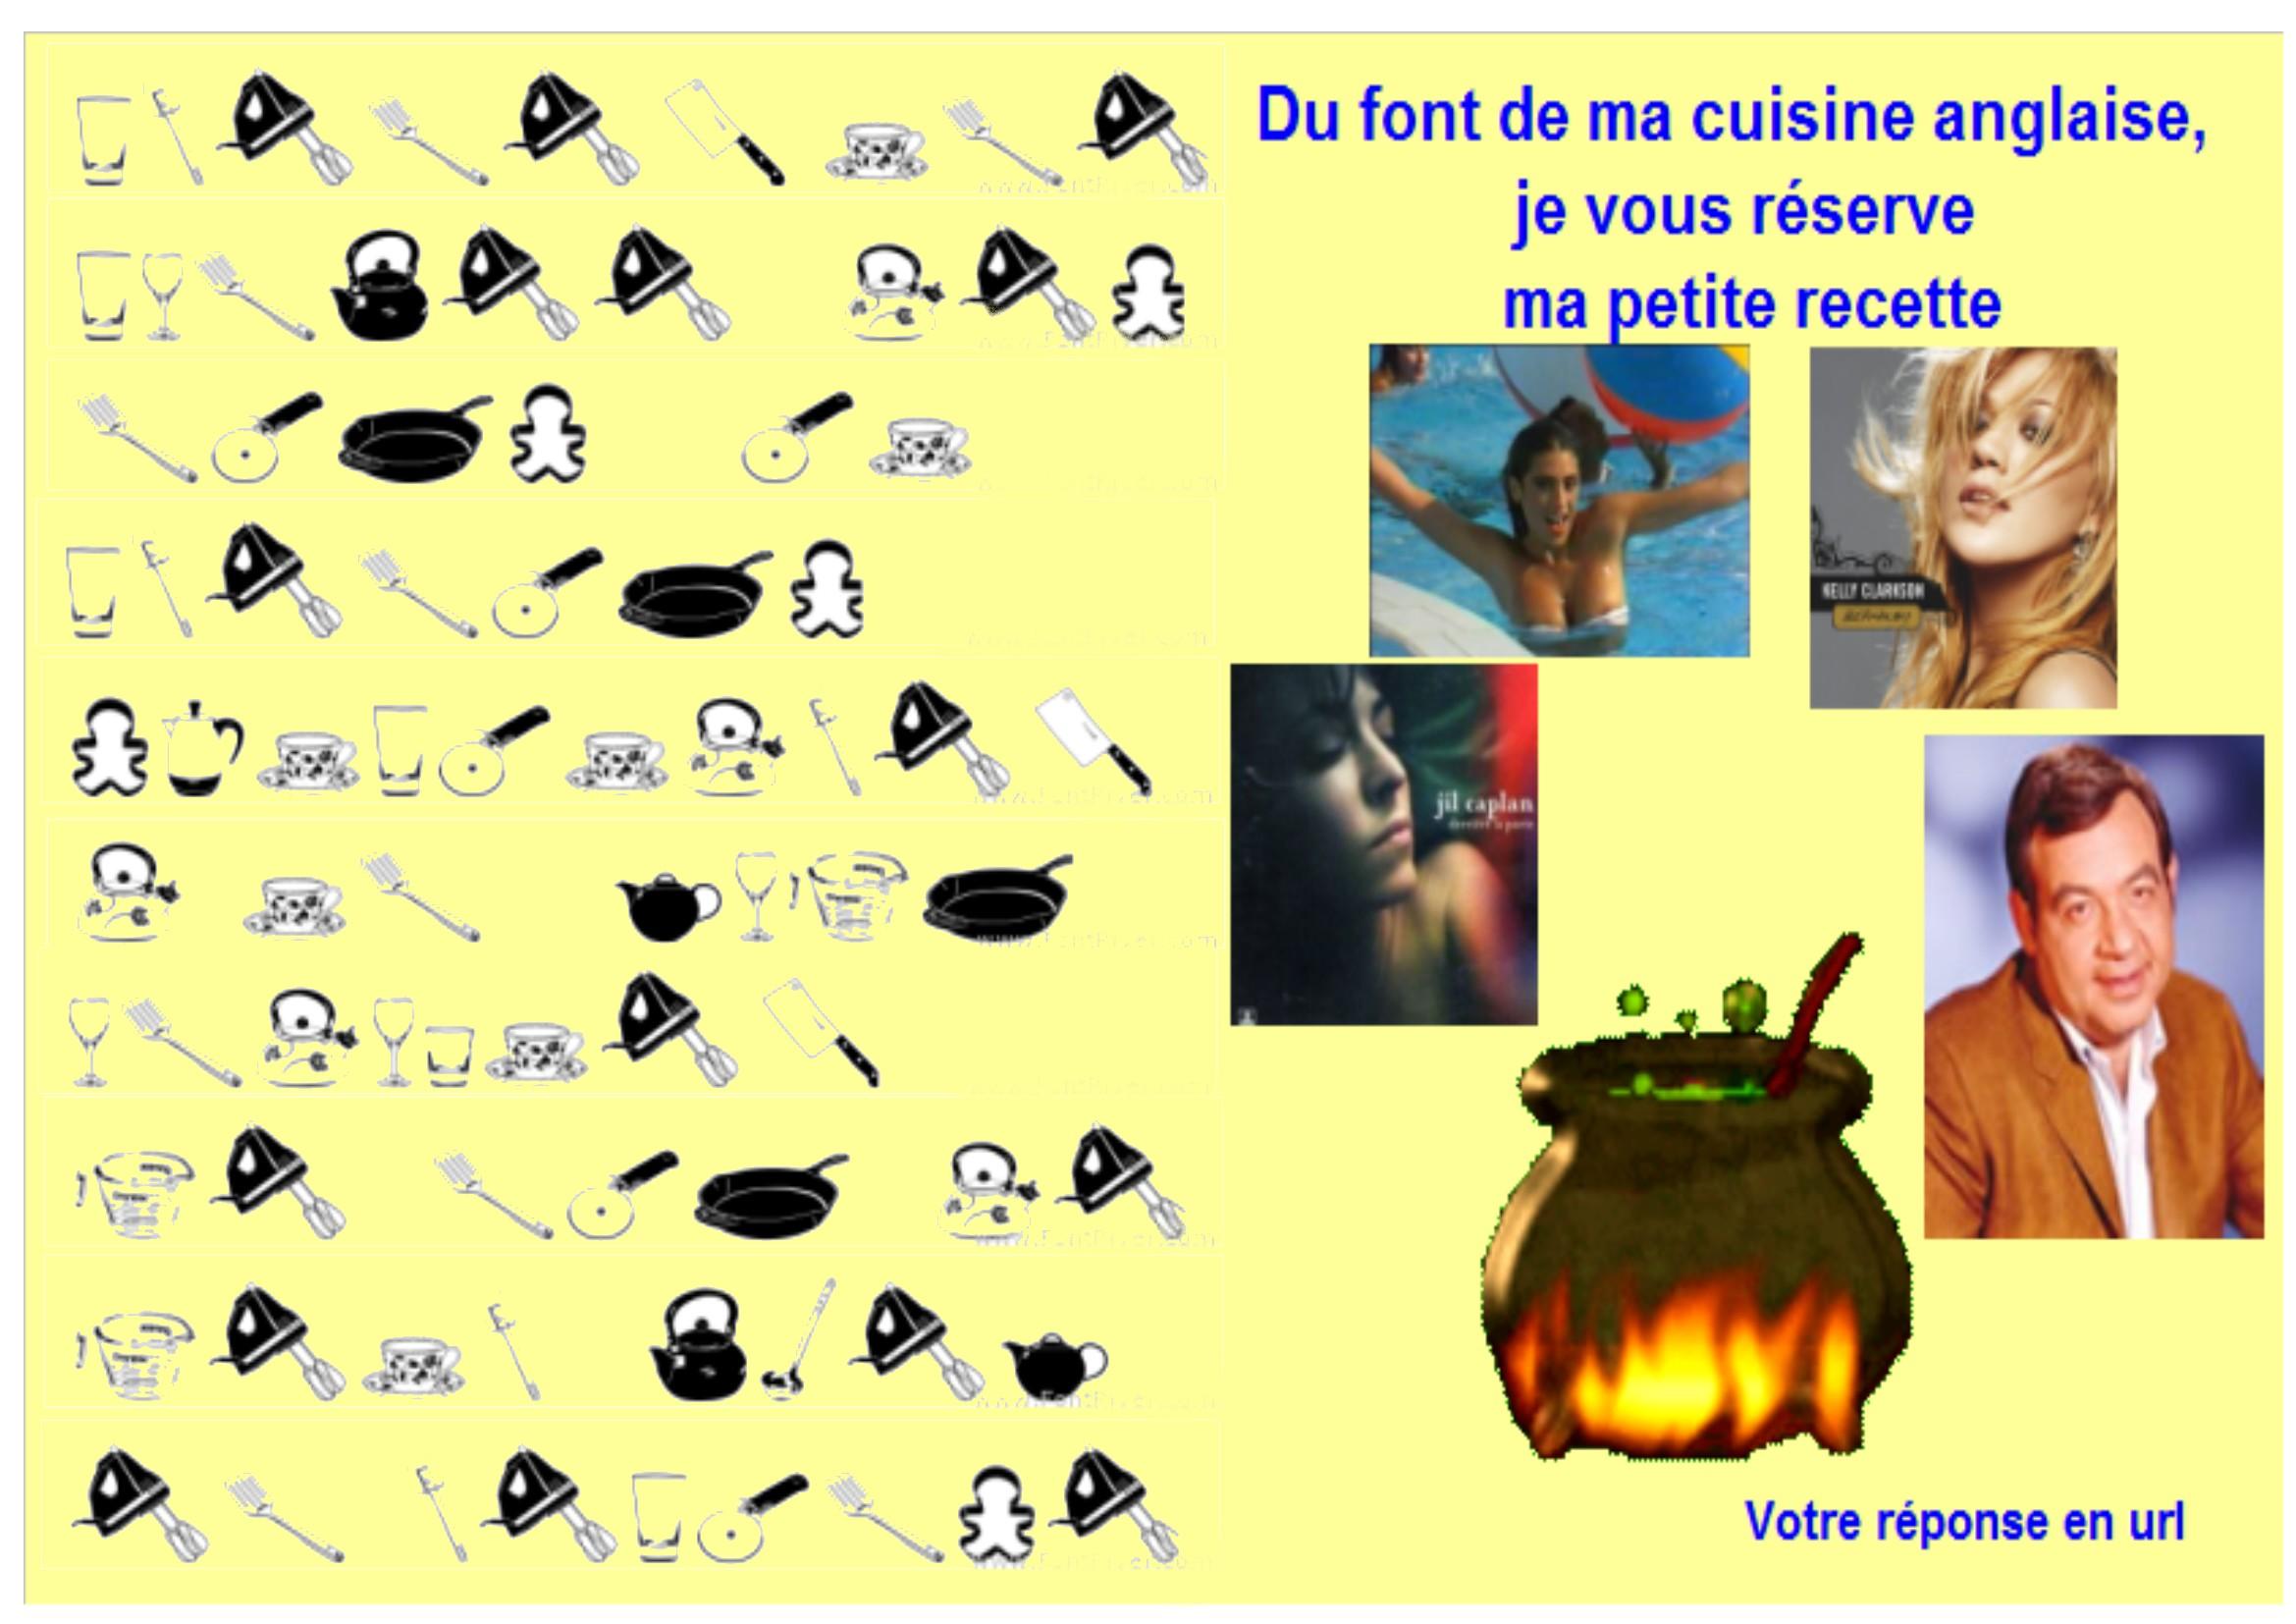 http://www.prise2tete.fr/upload/moicestmoi-cadex05-tombosley.JPG